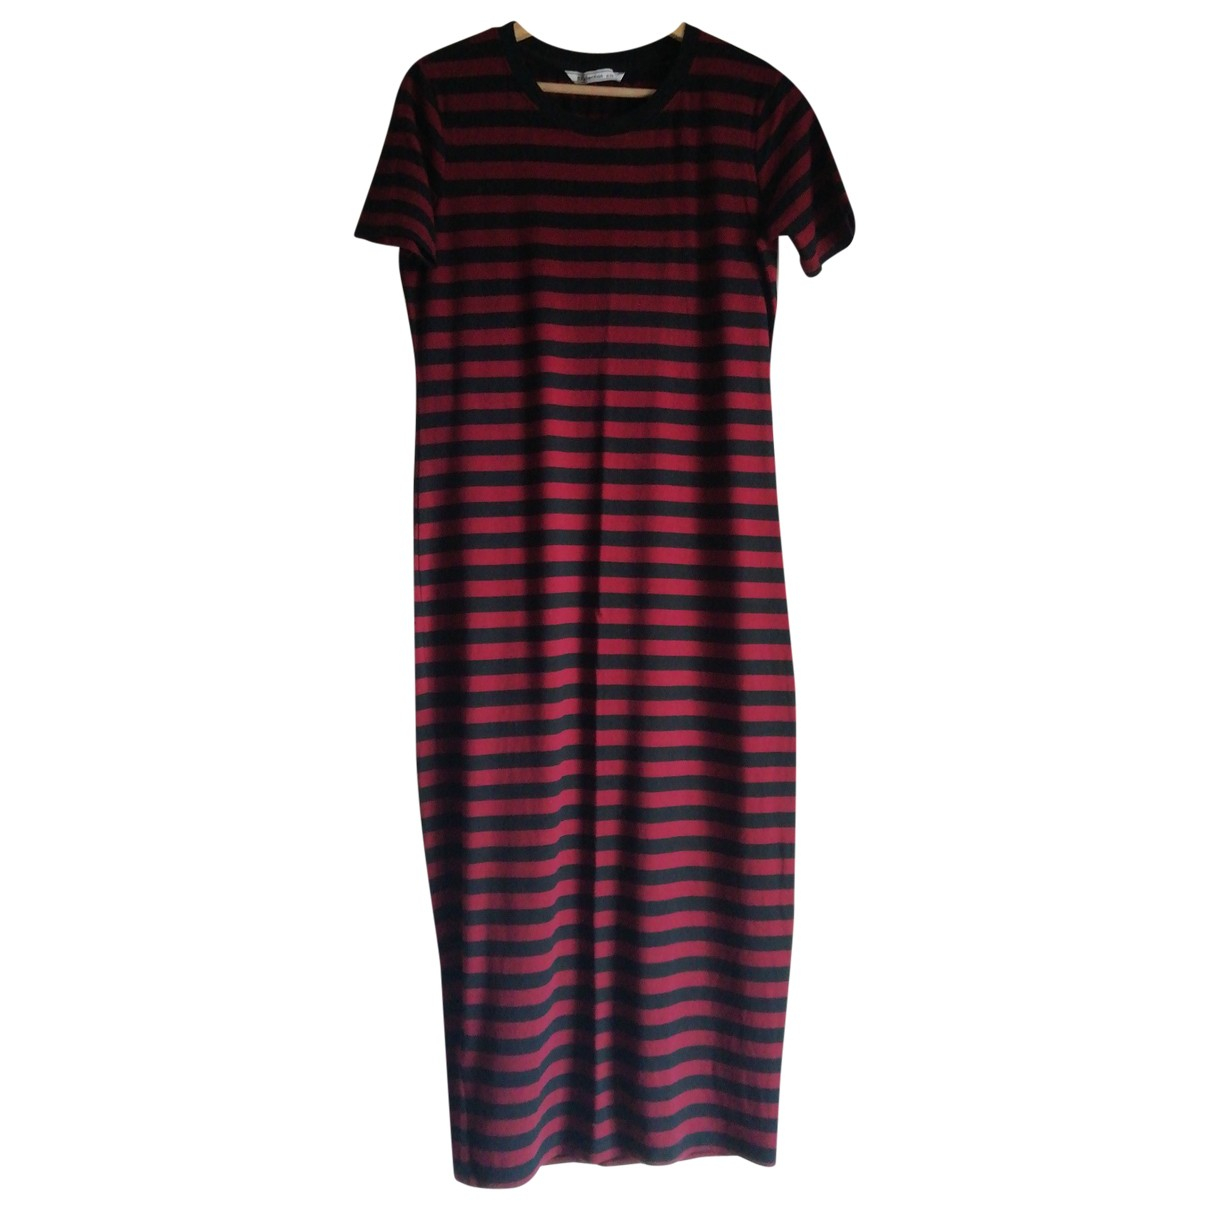 Silvian Heach \N Burgundy dress for Women 46 IT